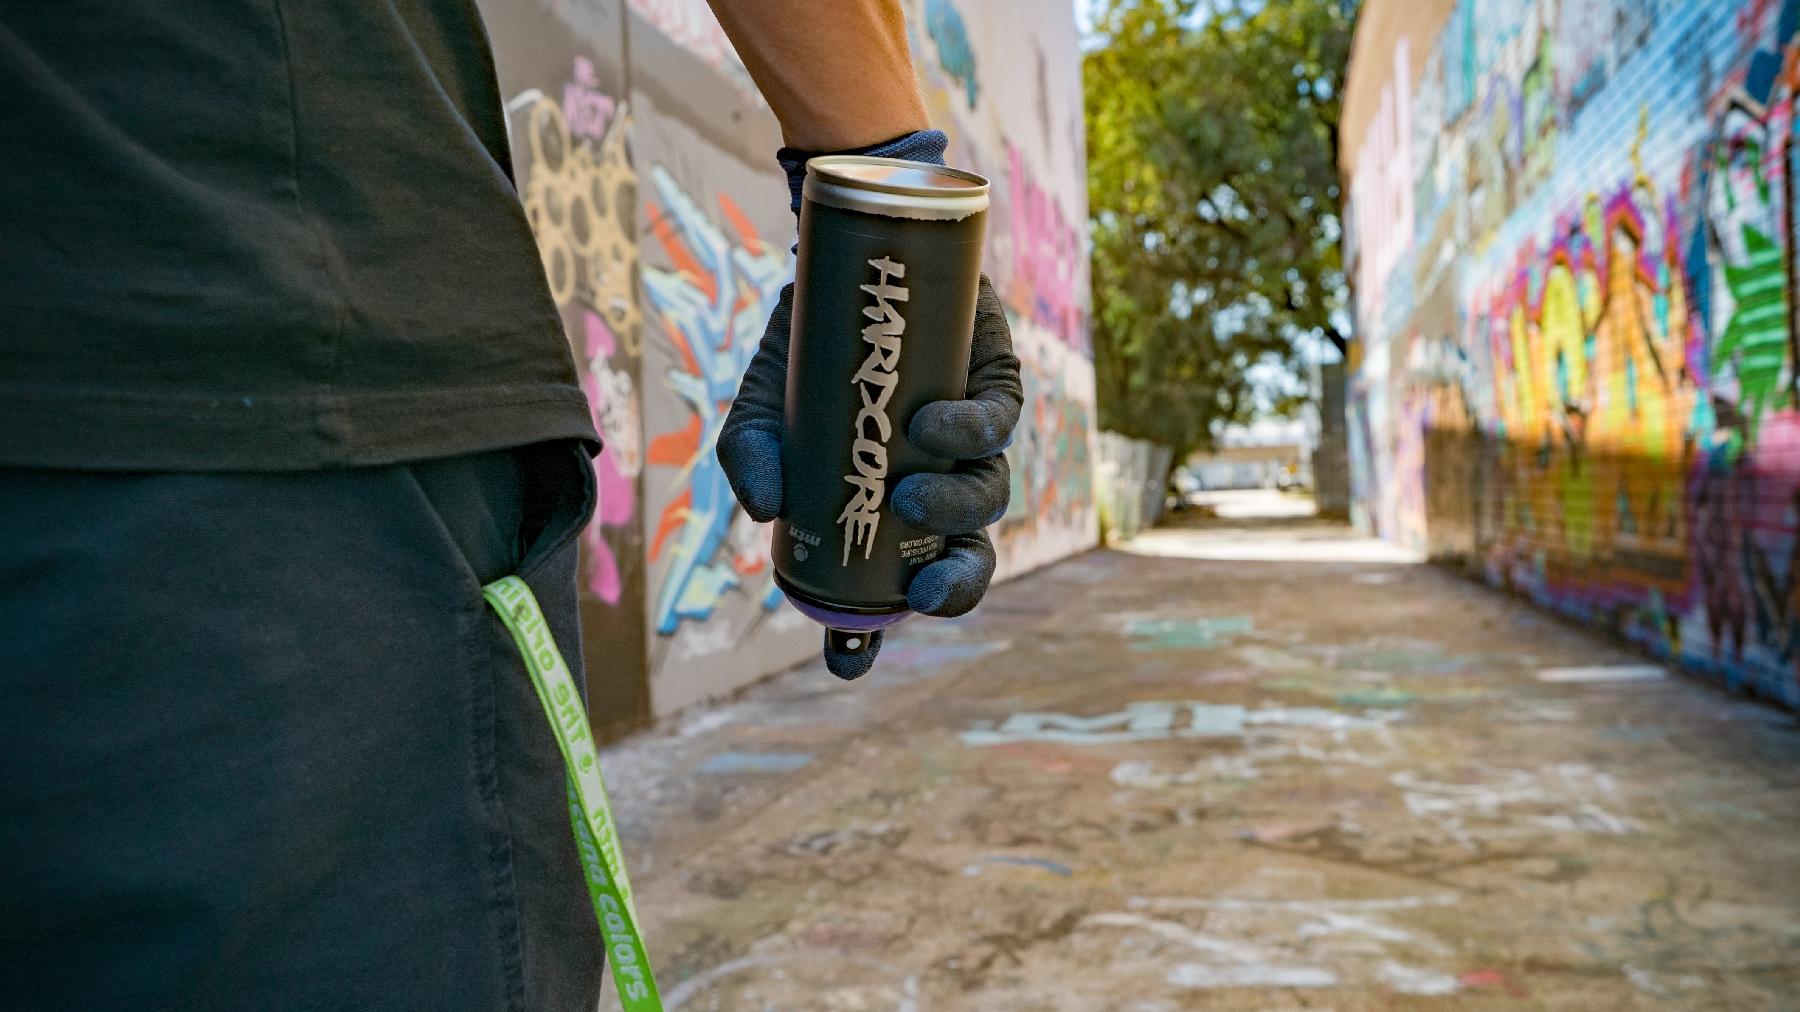 Shatro graffiti shop